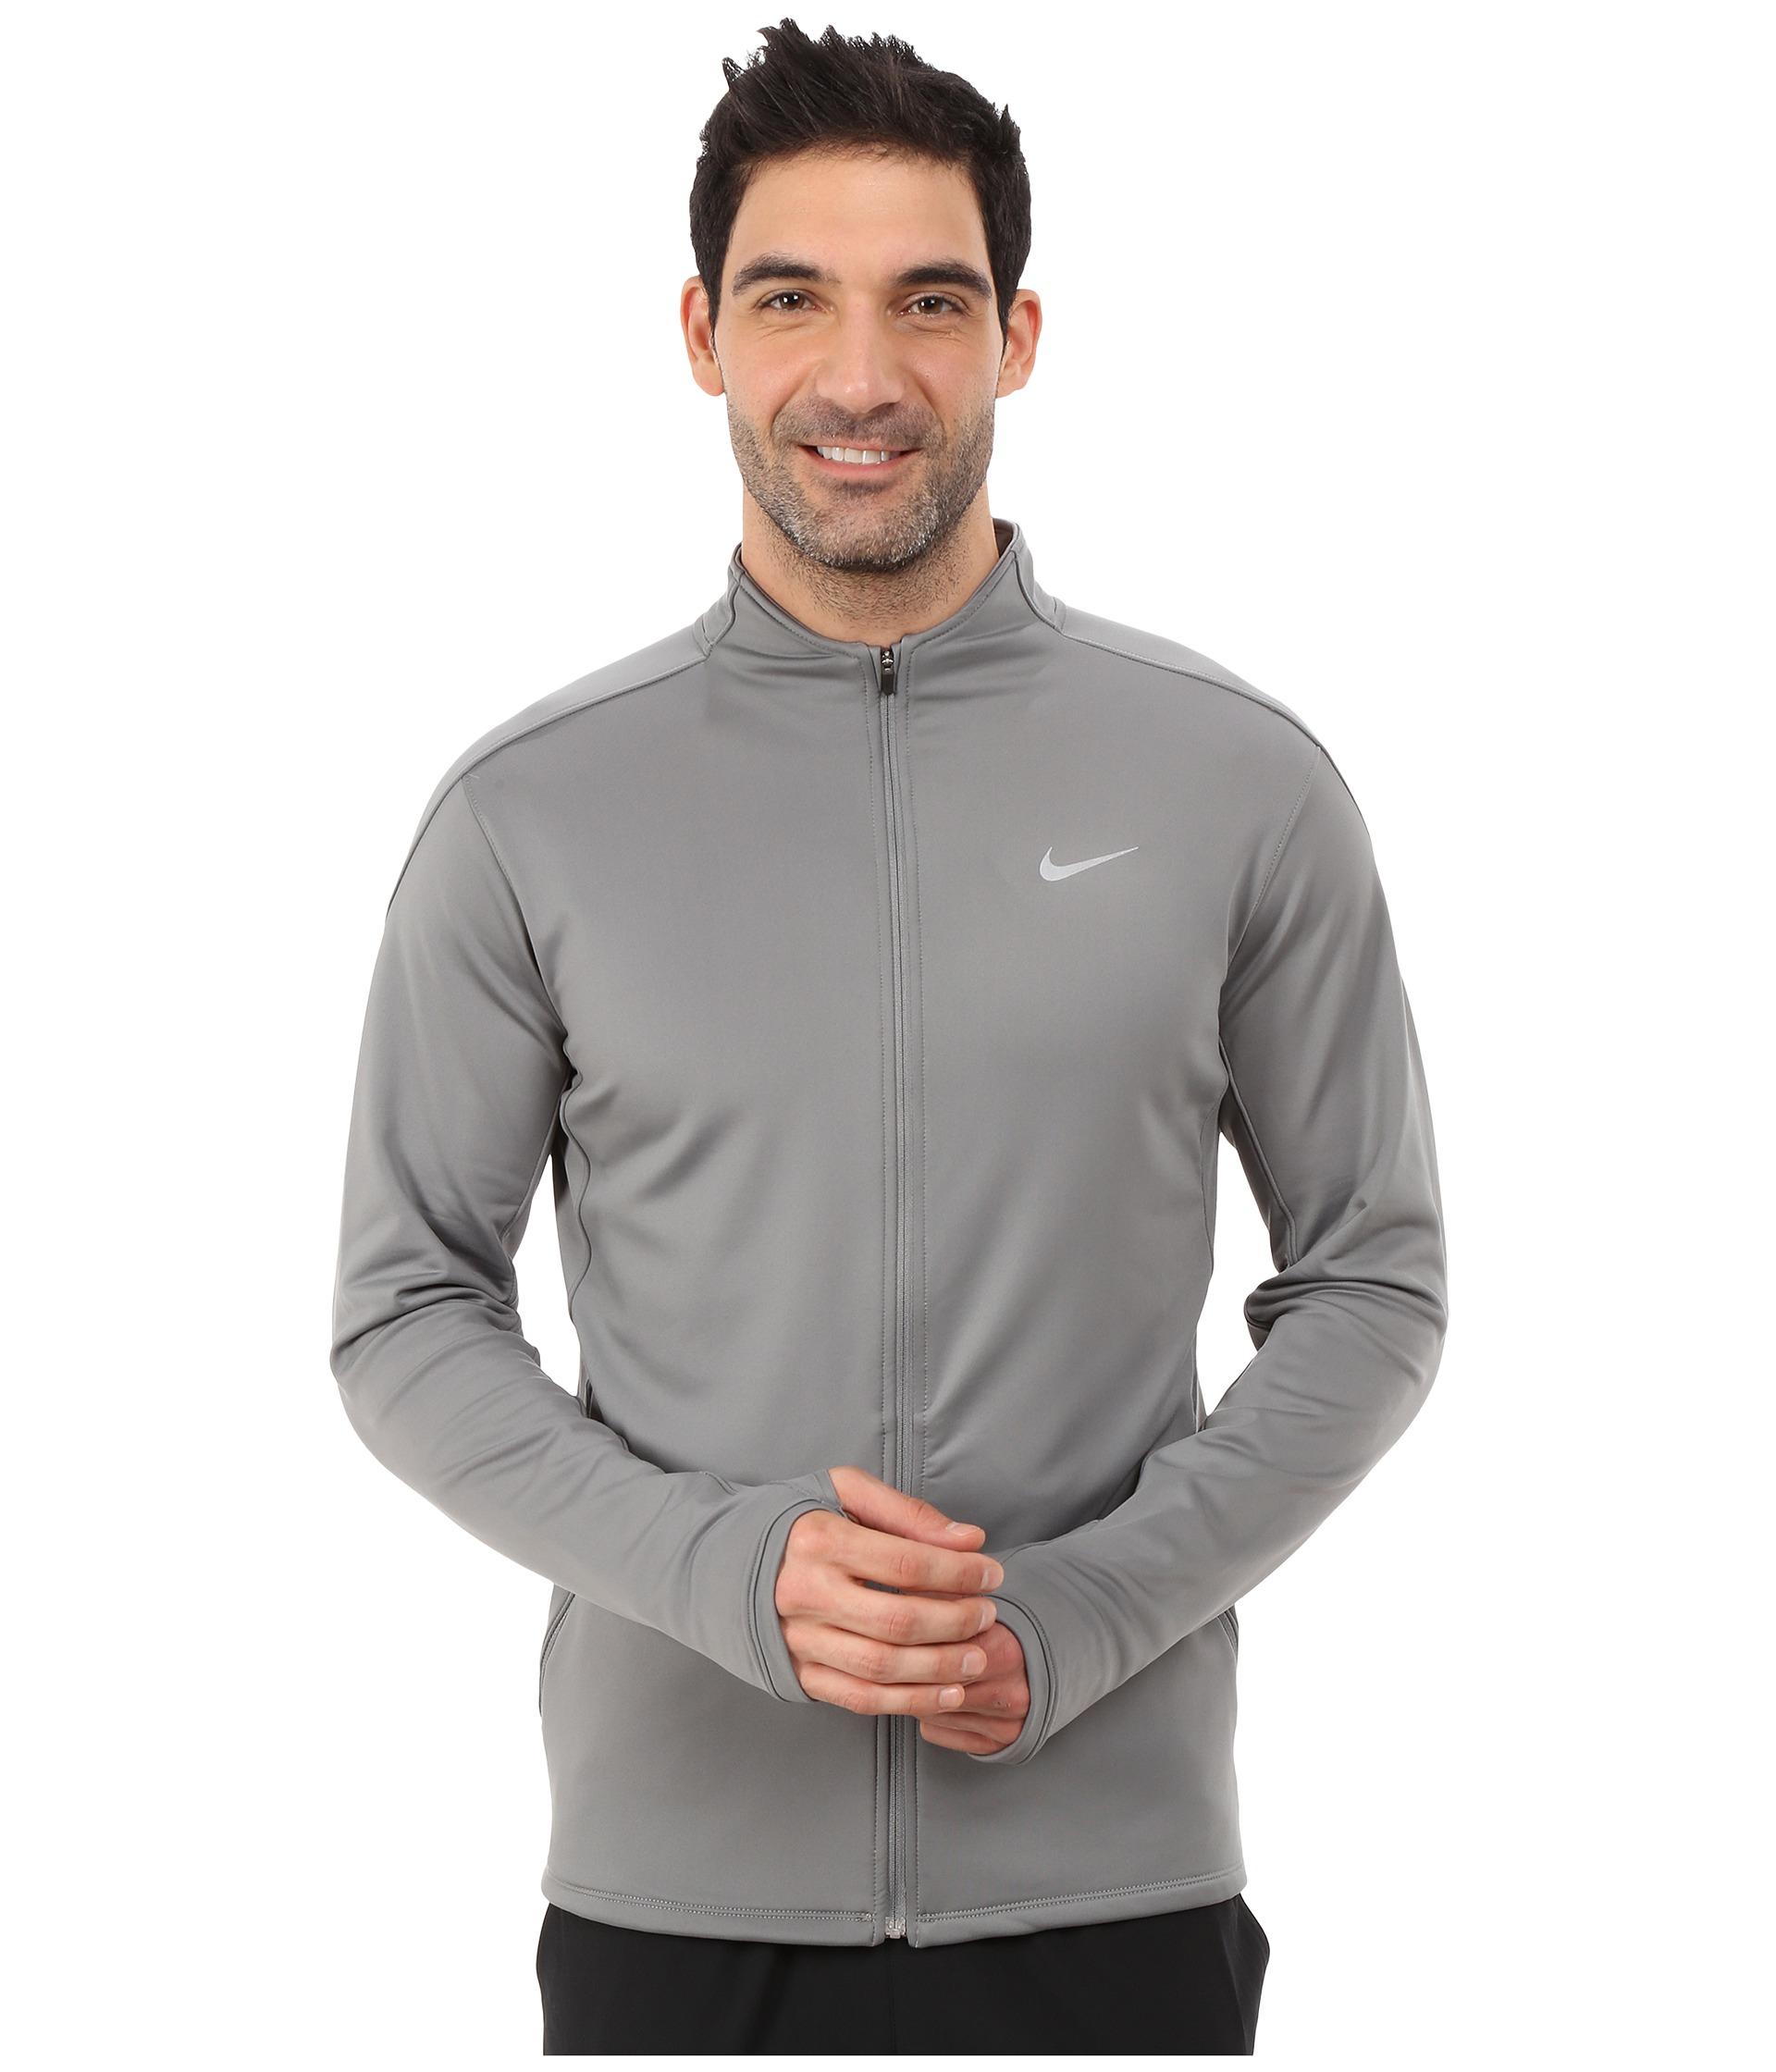 a802ae89a6cc2 Men's Gray Dri-fit™ Thermal Full-zip Running Jacket